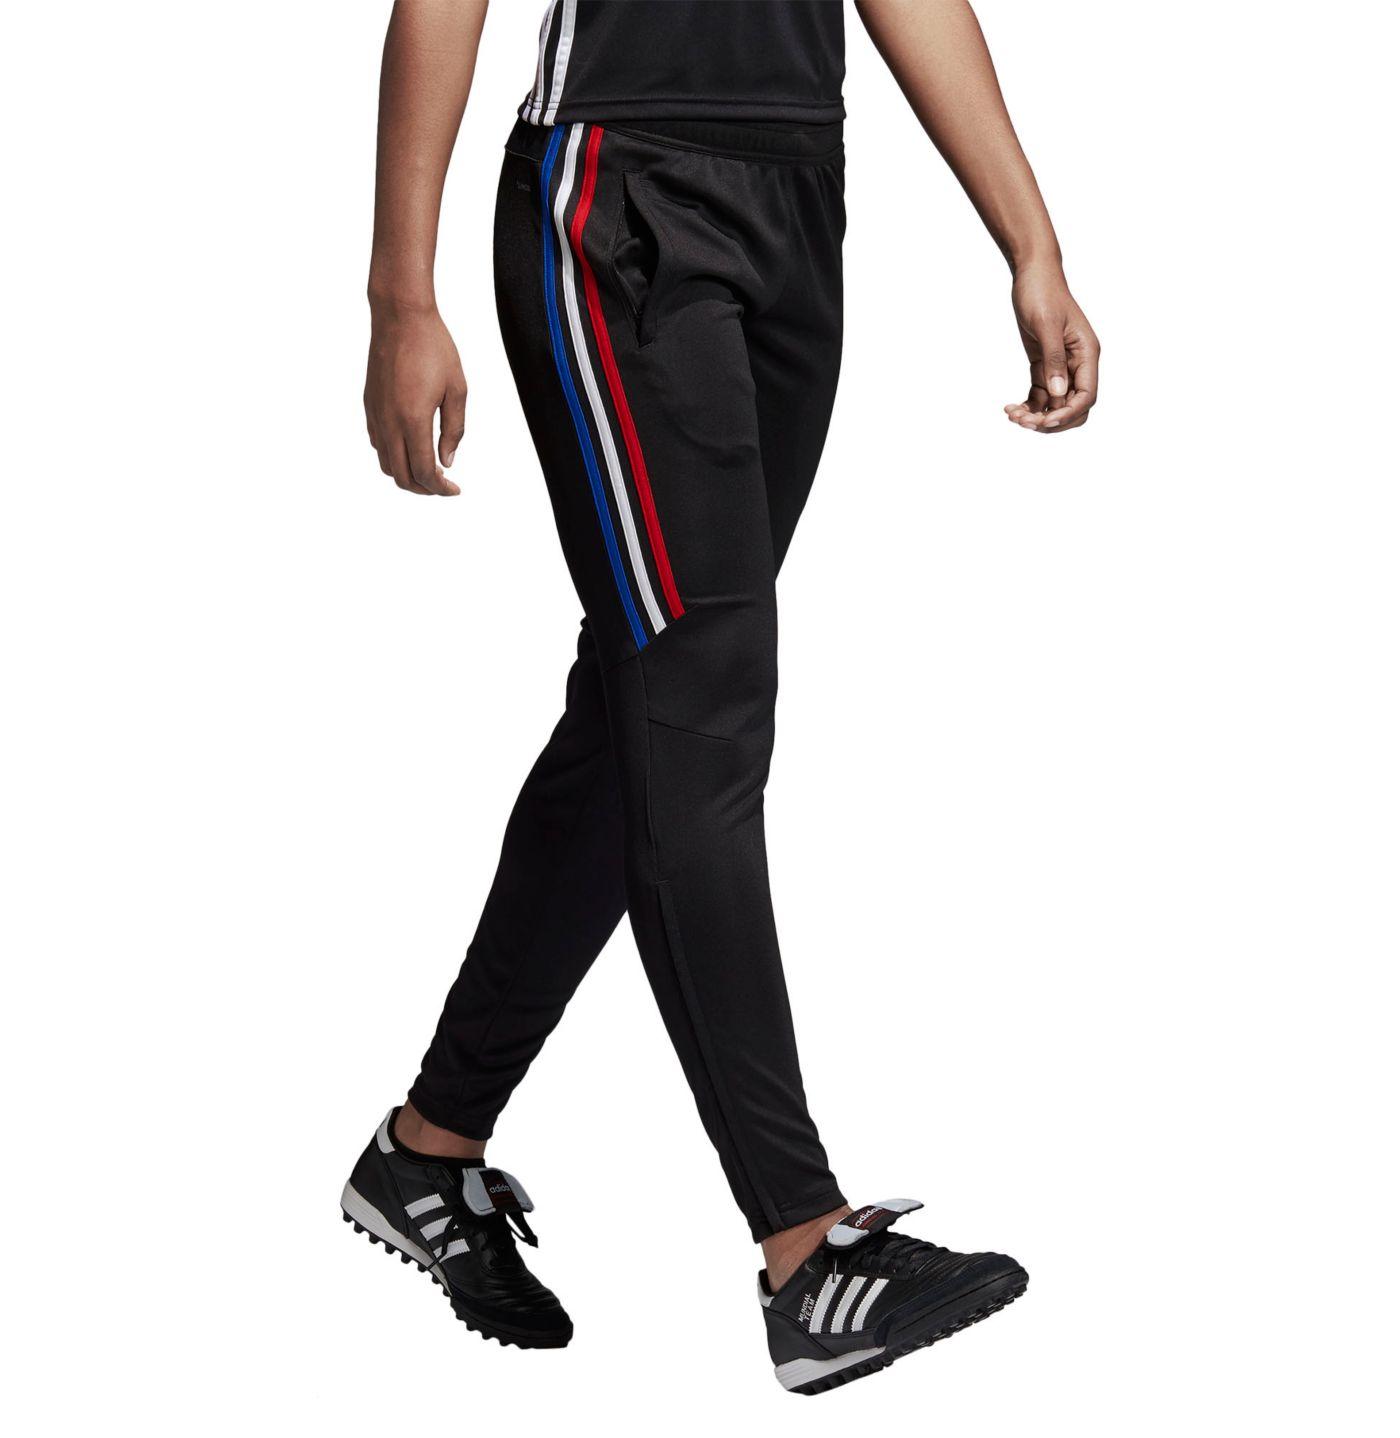 adidas Women's Tiro 17 Americana Soccer Training Pants